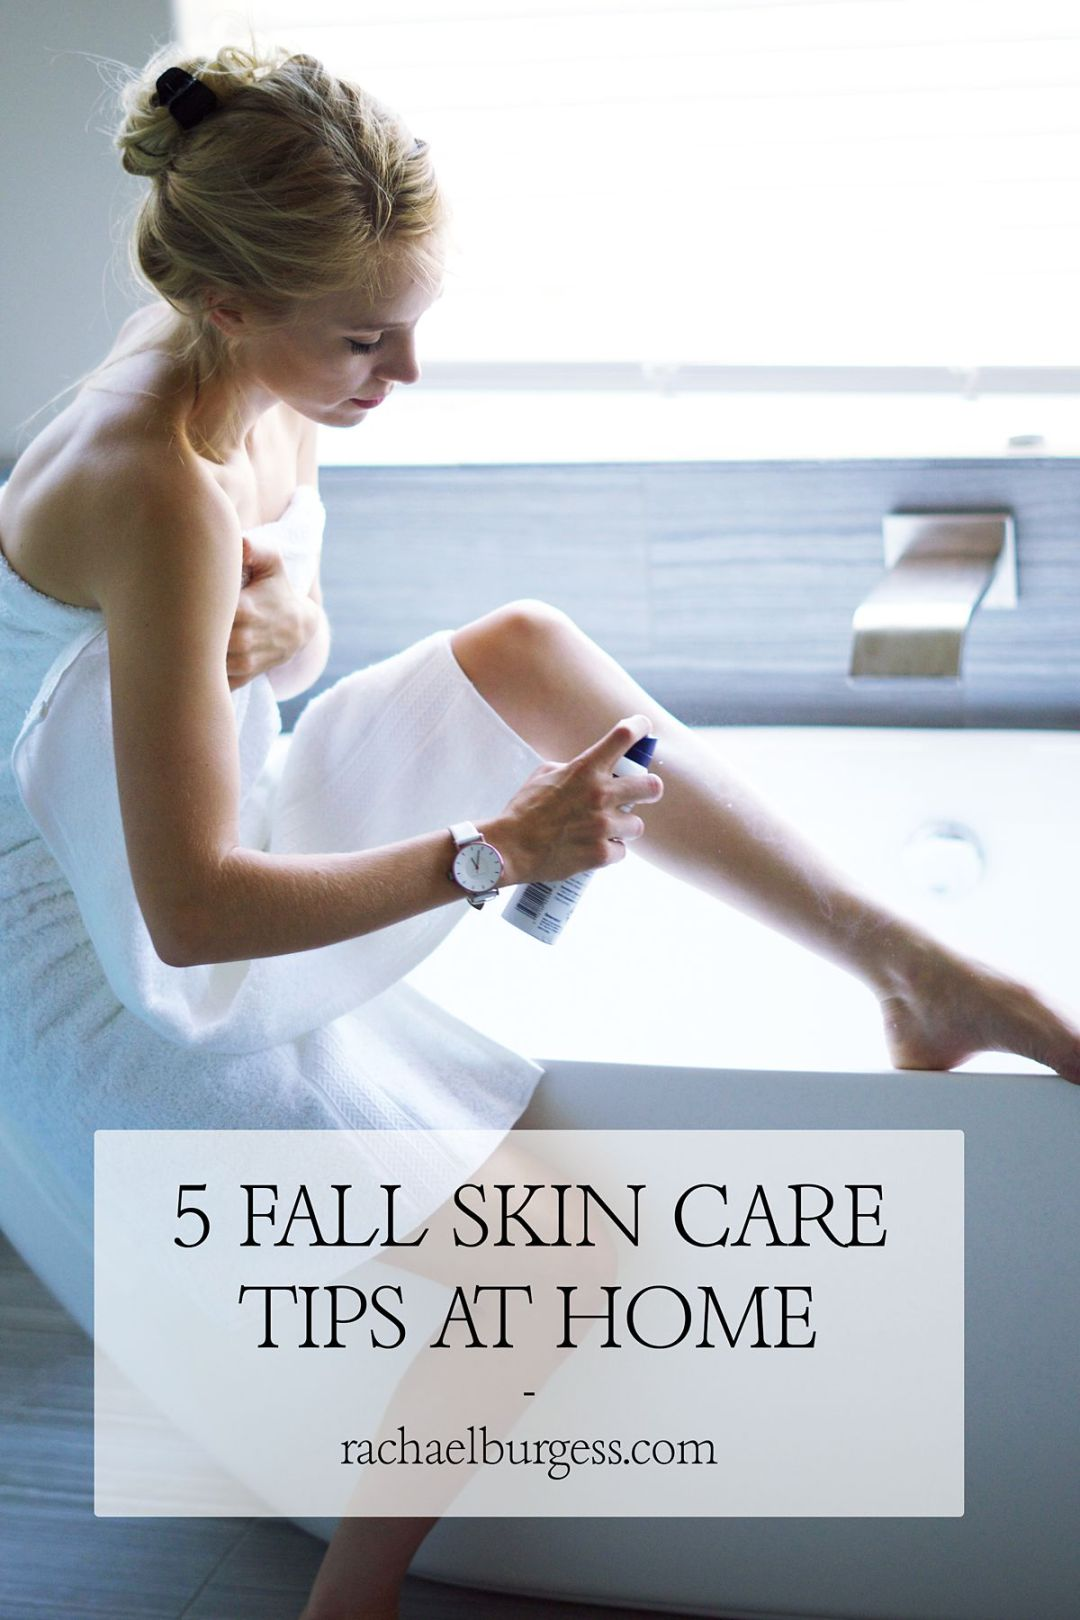 Fall Skin Care At Home   Rachael Burgess